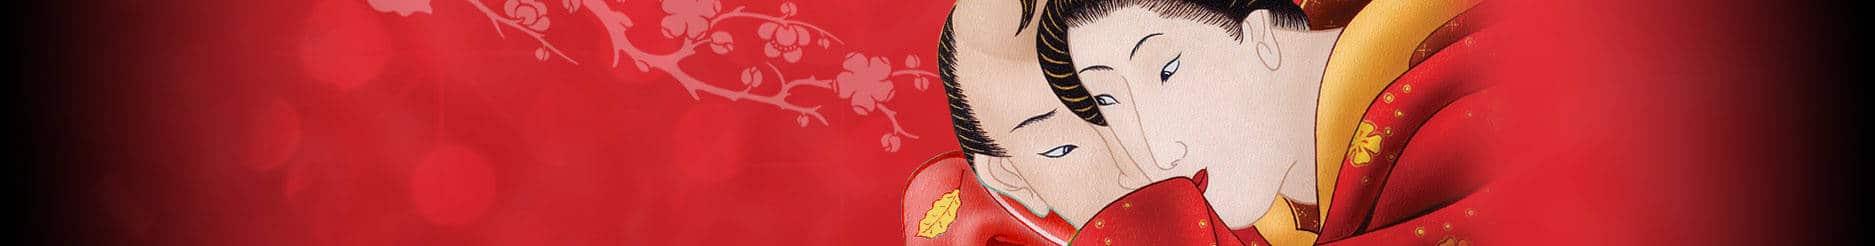 bougies de massage canderella, bougie de massage, bougie massage pas cher, massage a la bougie, bougie huile de massage, massage bougie, massage à la bougie, bougie de massage bio, bougie aphrodisiaque, shunga, huile de massage shunga, shunga erotic art, harunobu shunga, massage shunga